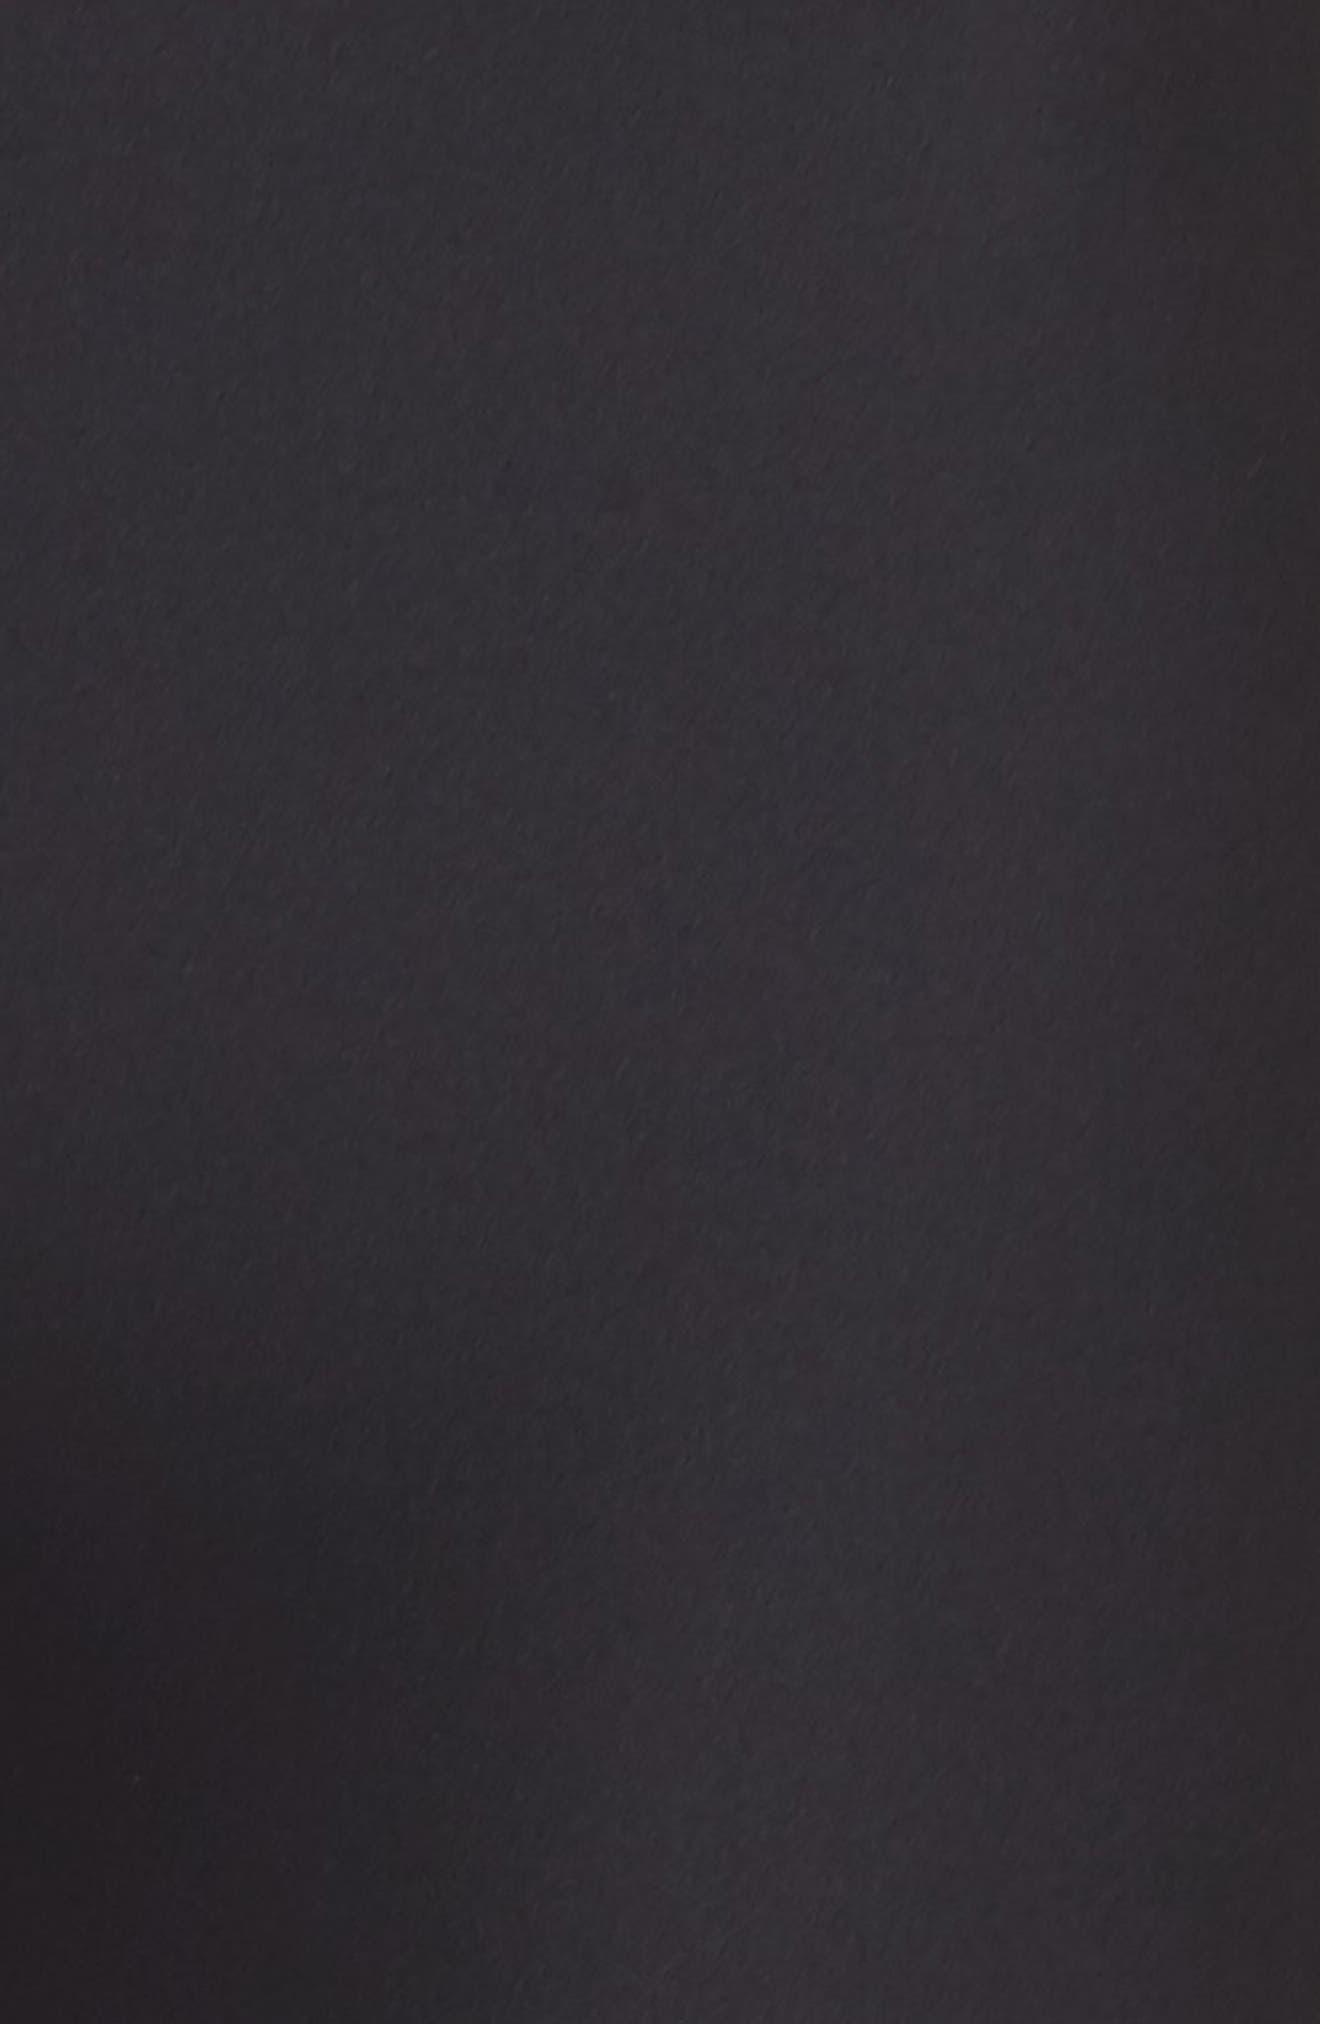 Ultra Lux Collegiate Leggings,                             Alternate thumbnail 6, color,                             001